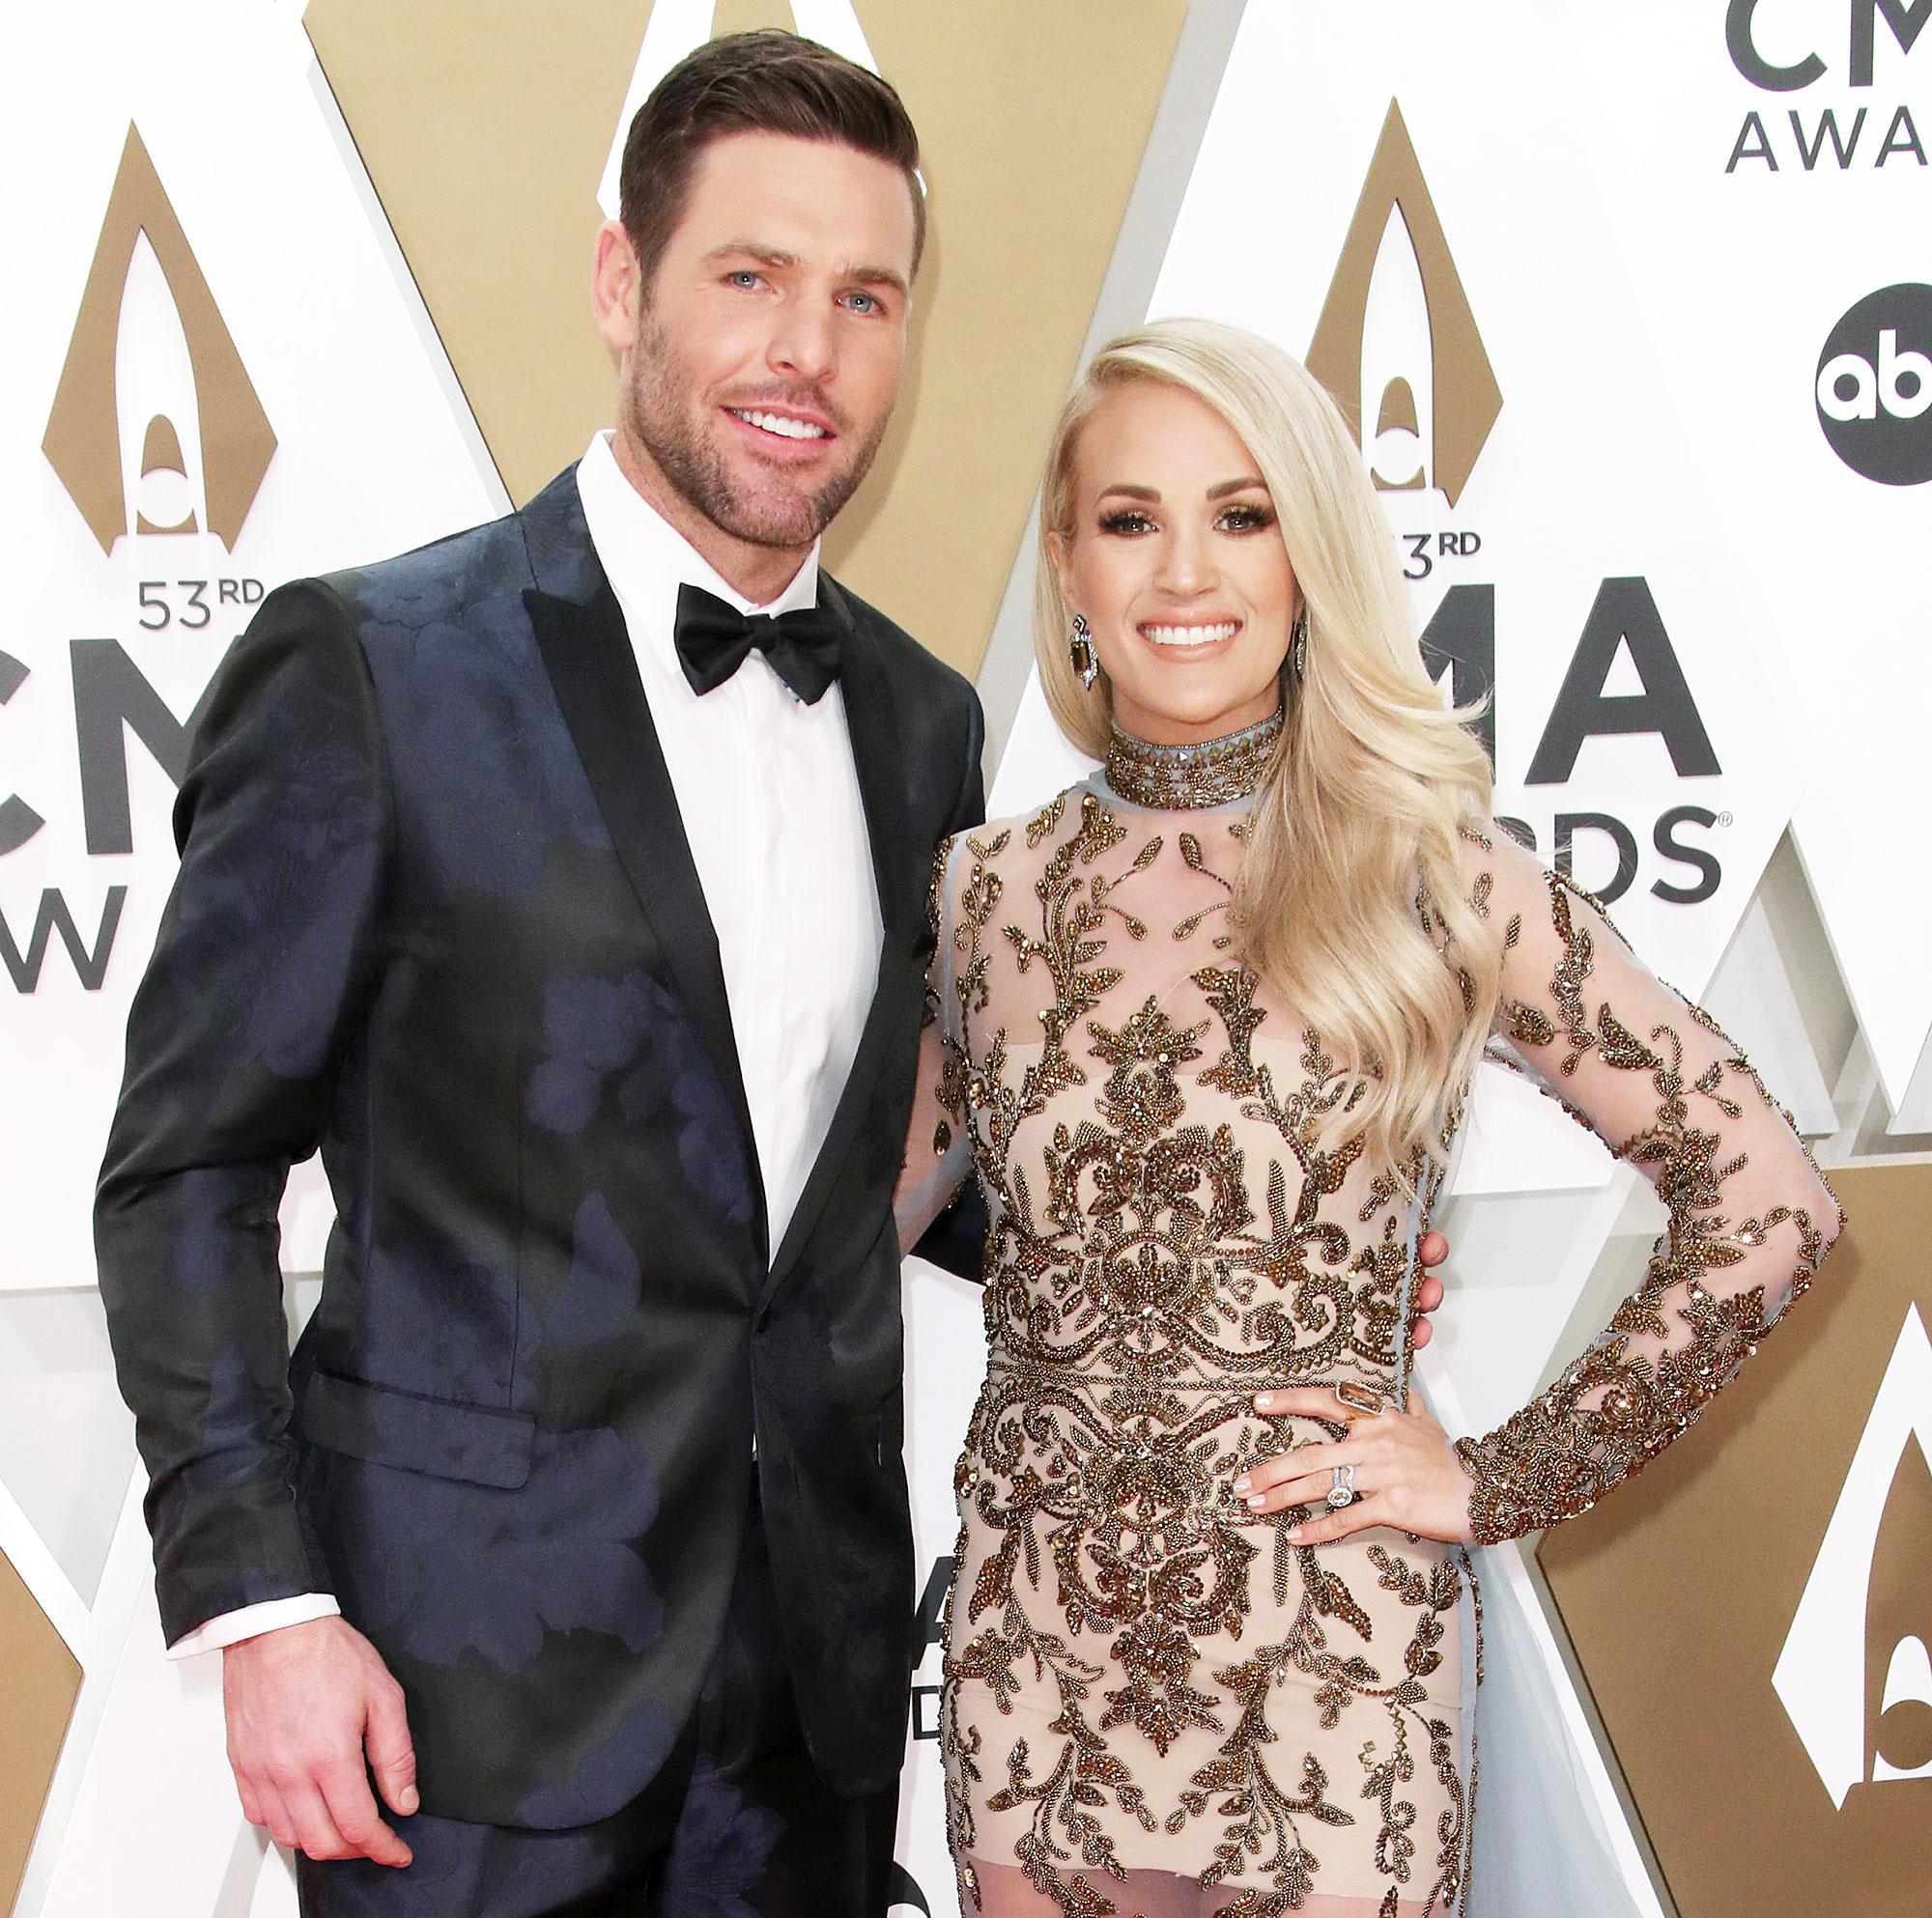 Carrie Underwood's Husband Mike Fisher Took Sons Into Safe Room During Nashville Tornado